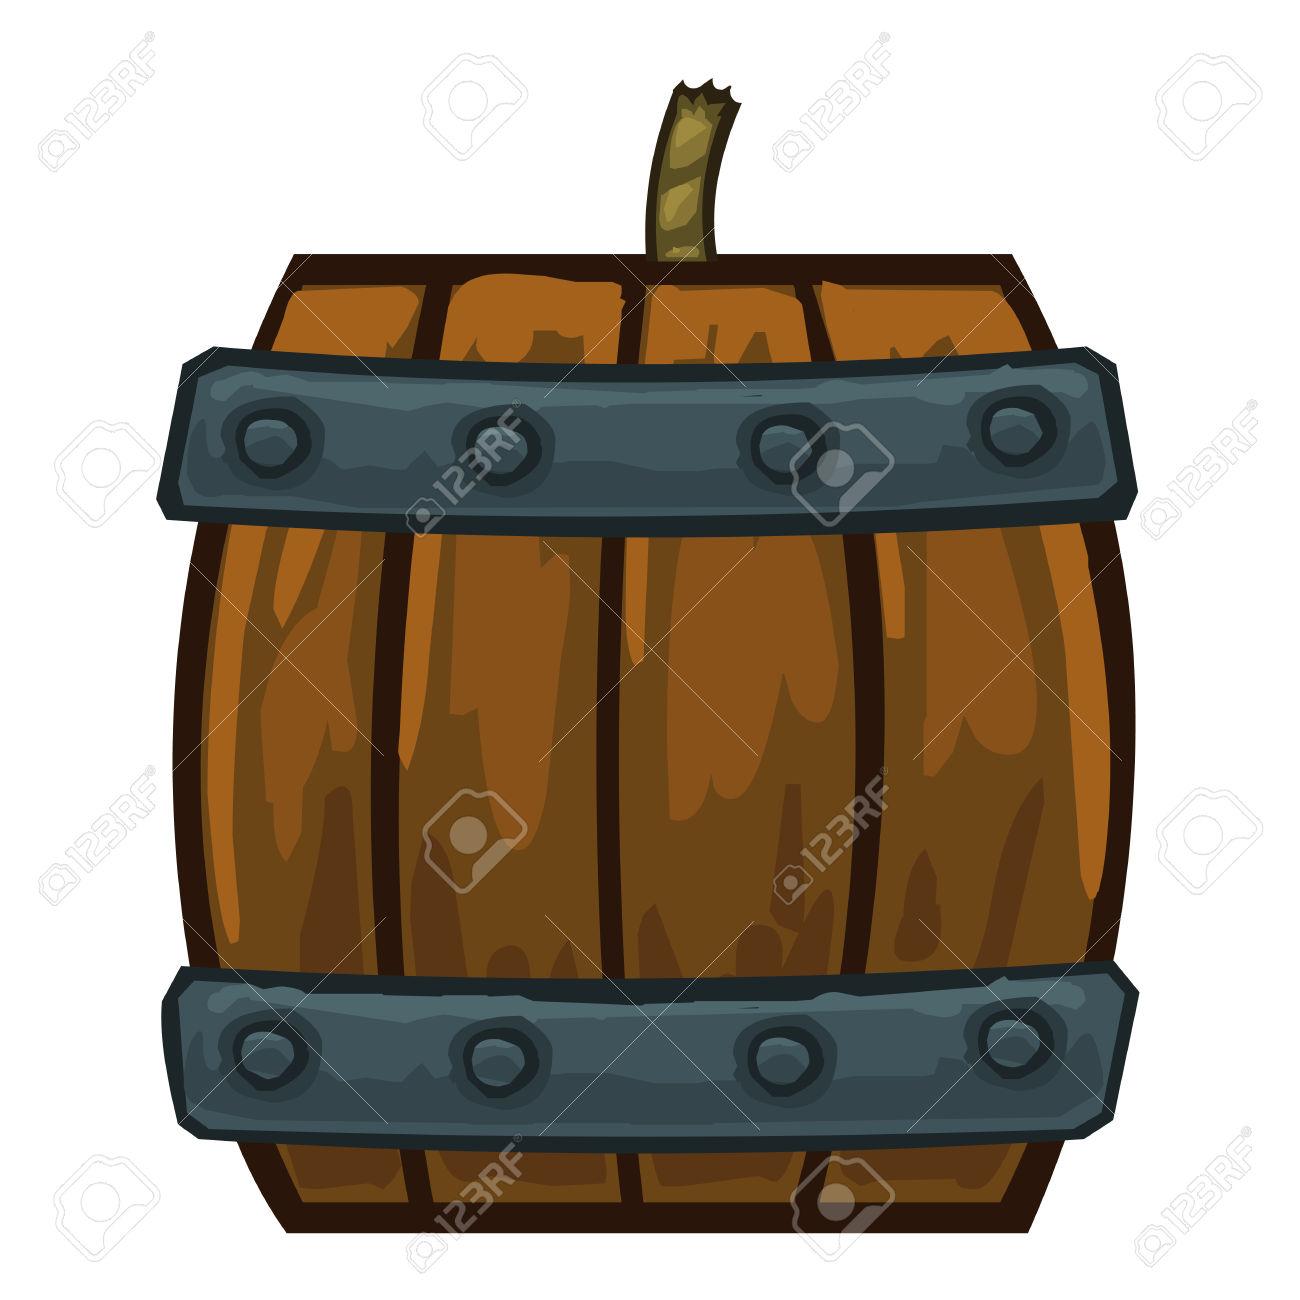 Barrel clipart vector. Gunpowder pencil and in